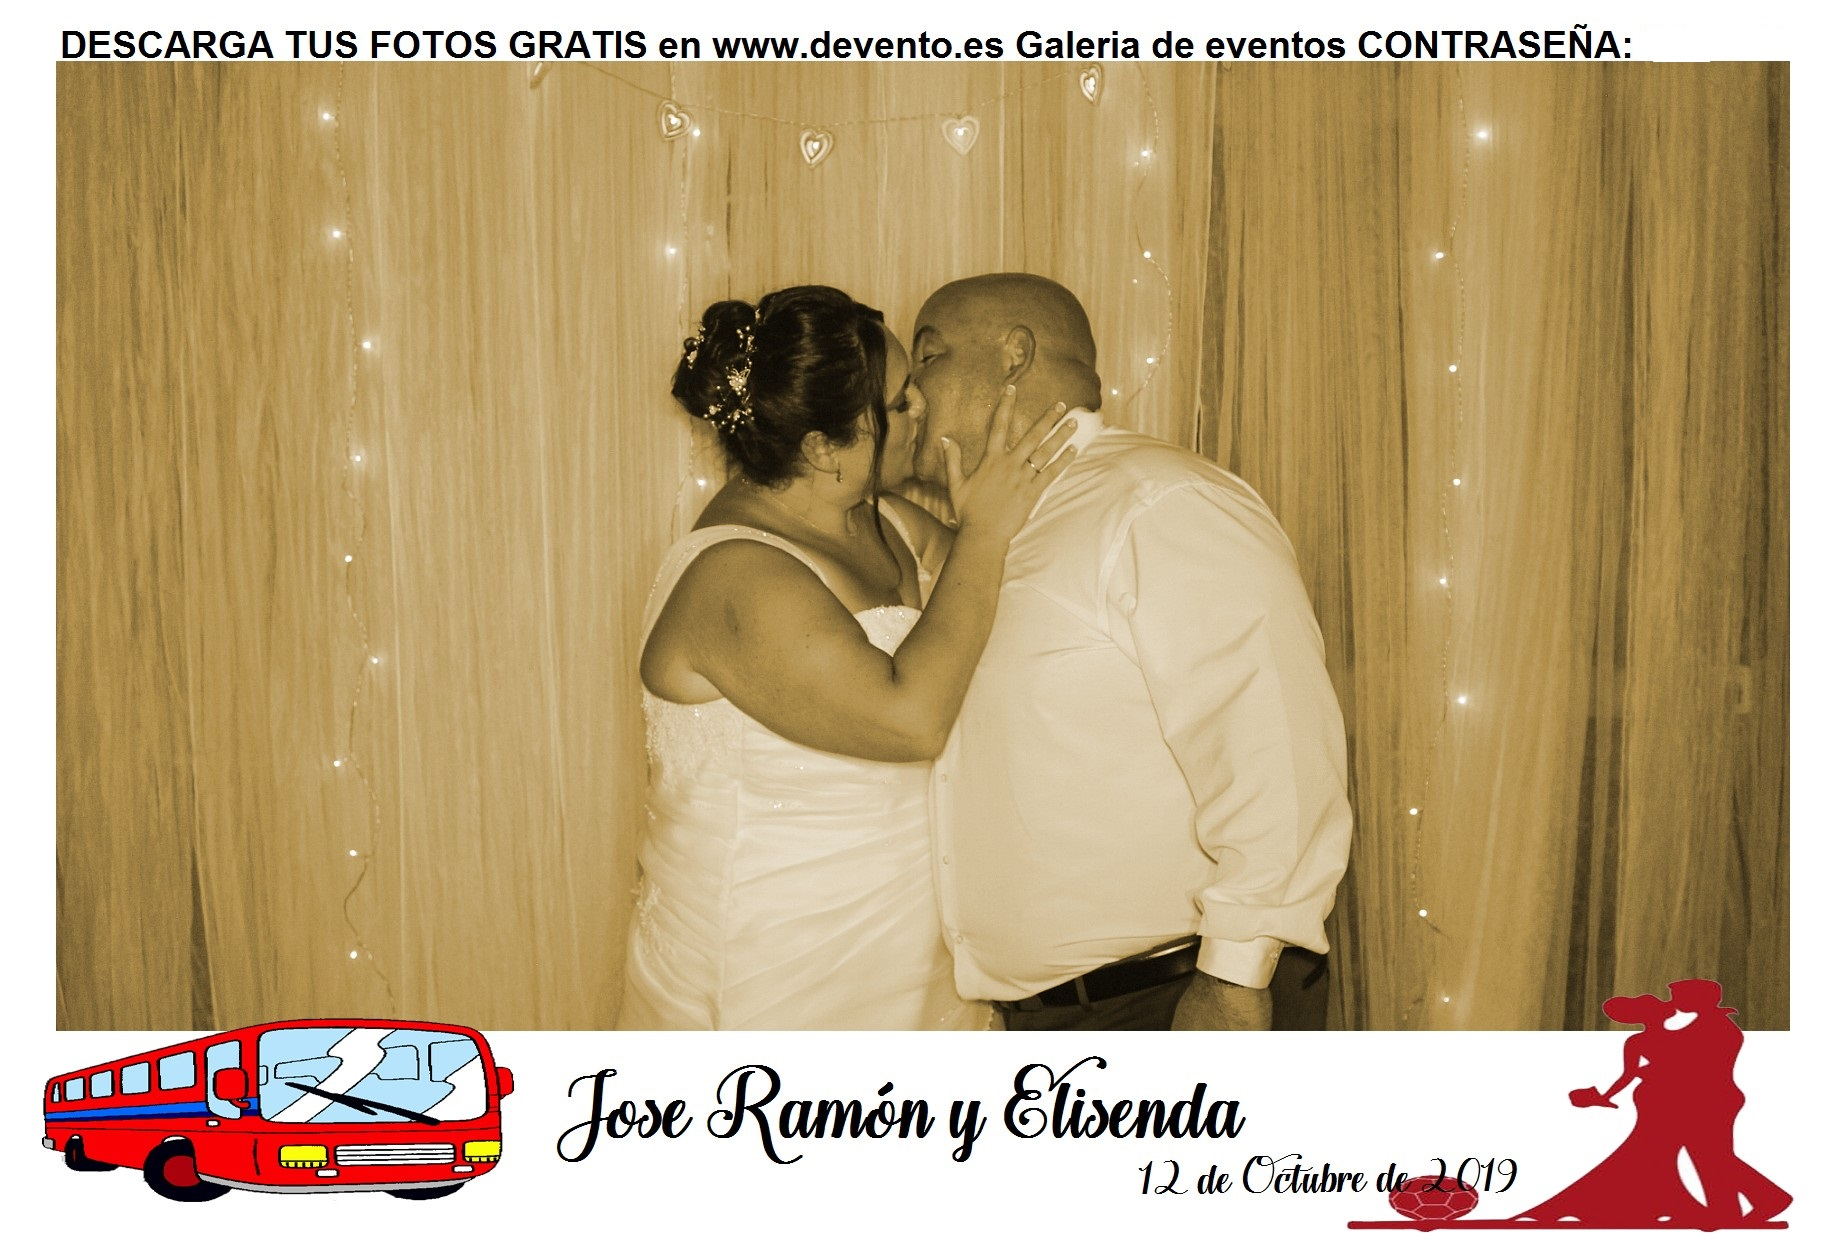 JOSE RAMÓN Y ELISENDA